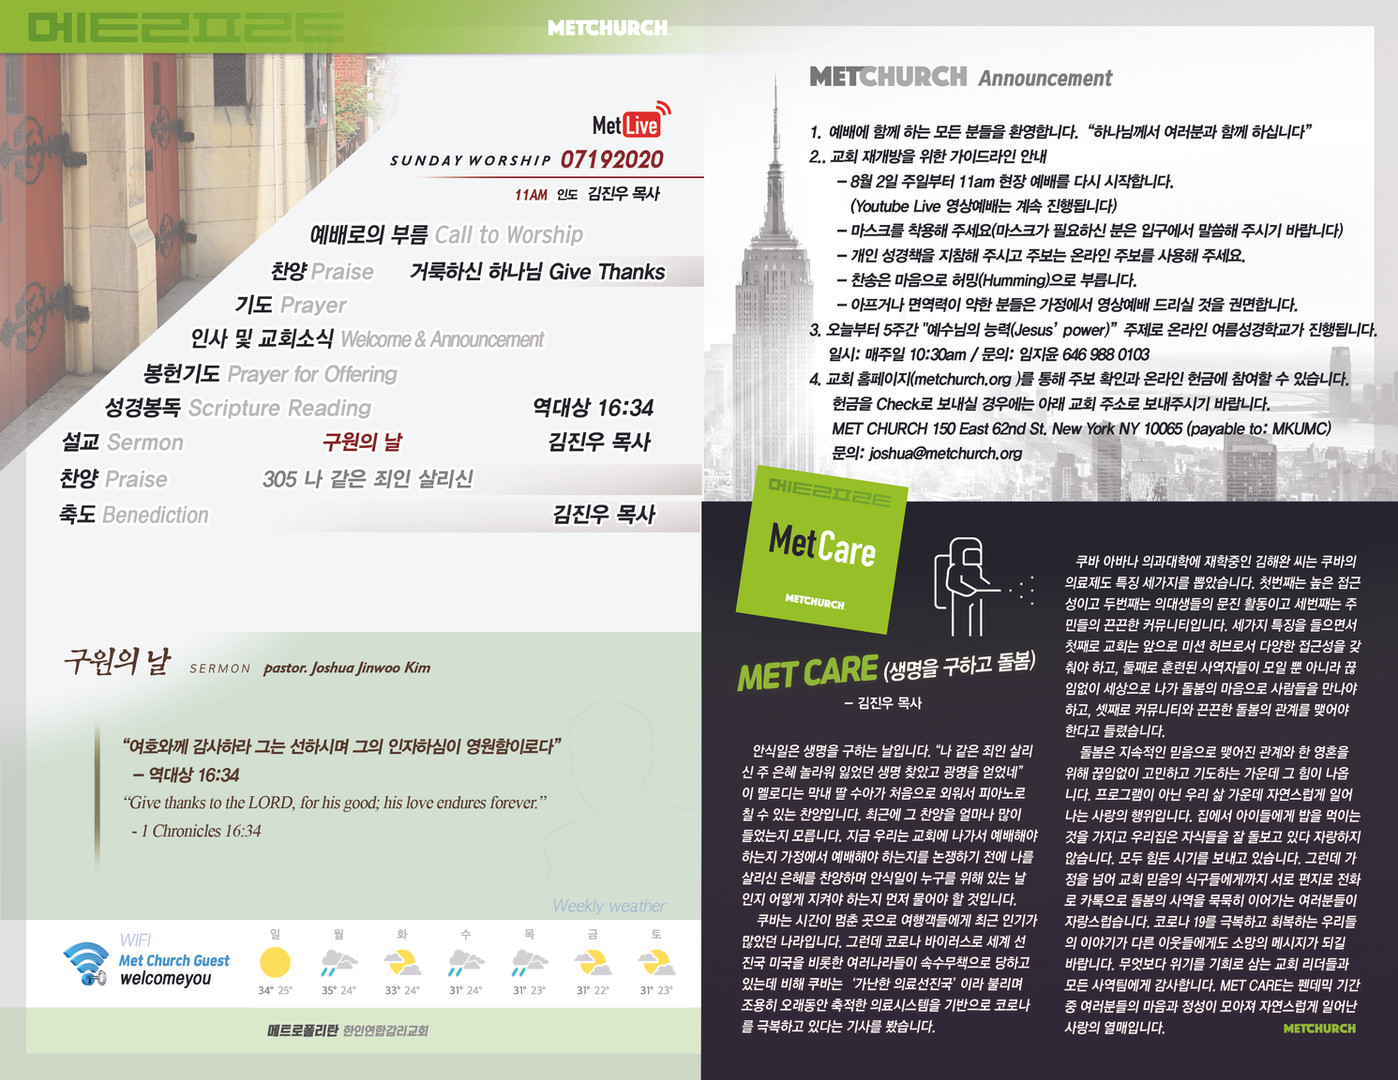 MetChurch_paper_Back_07192020.jpg